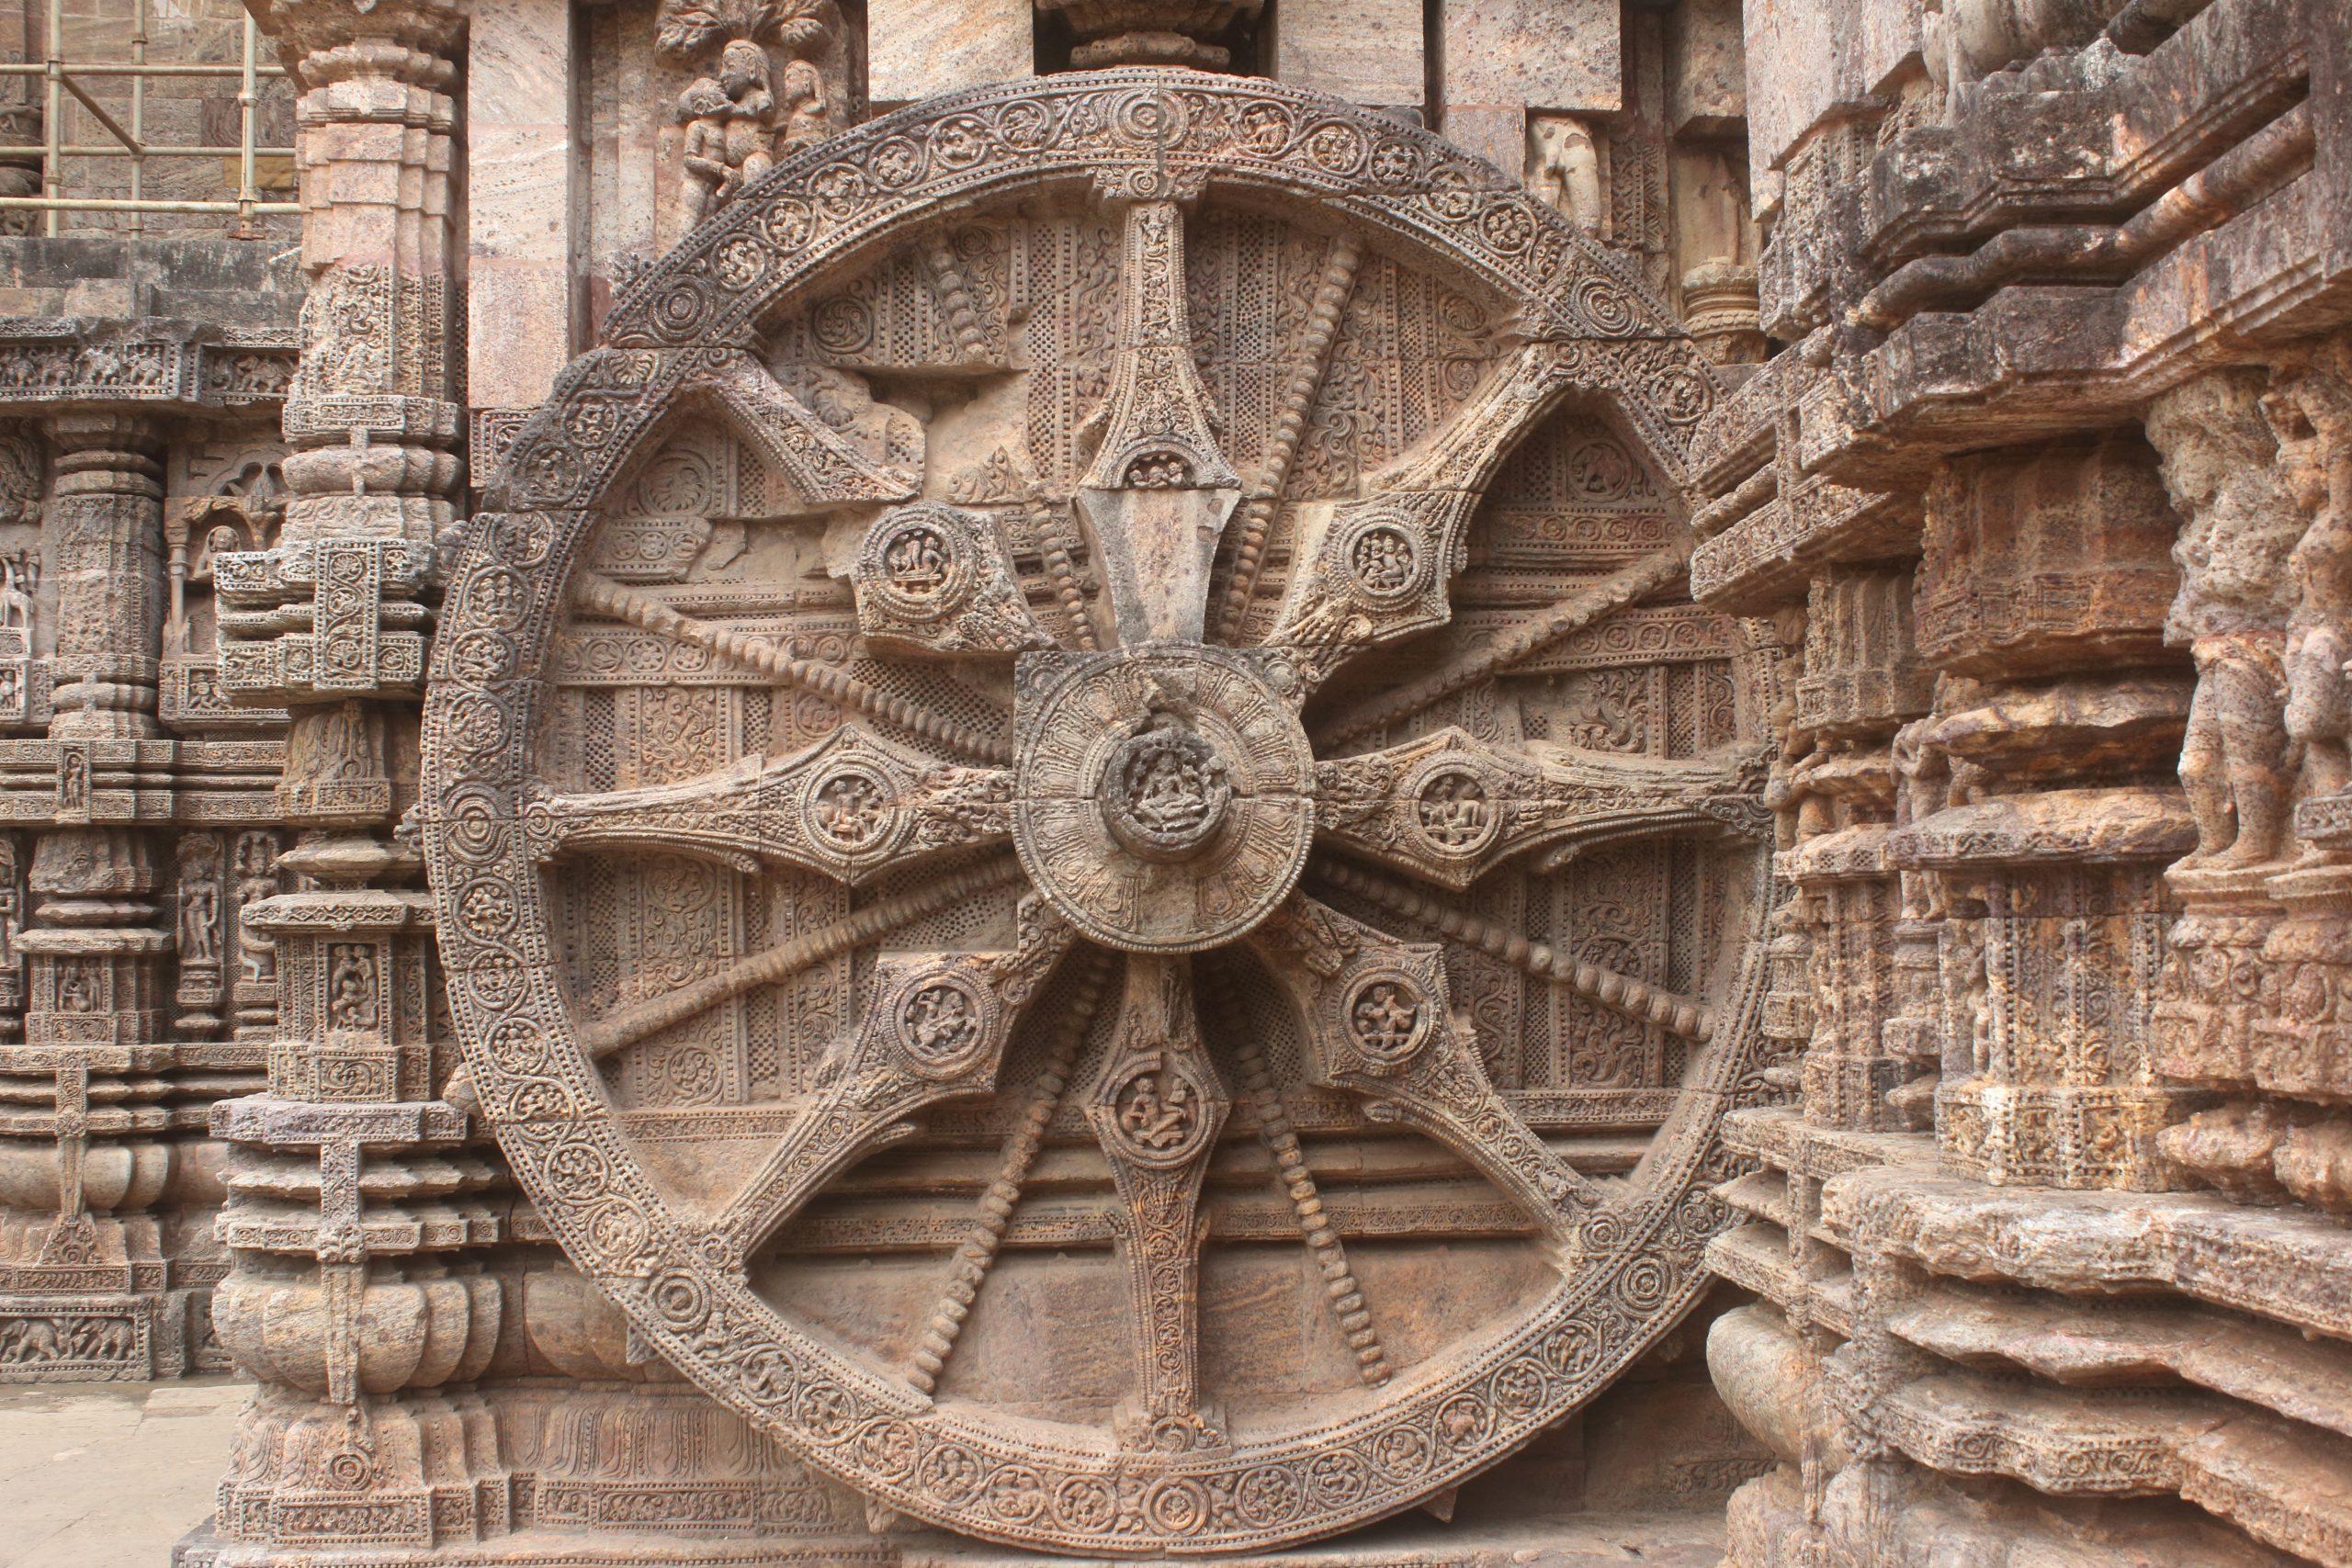 Stone wheel at Konark Sun Temple